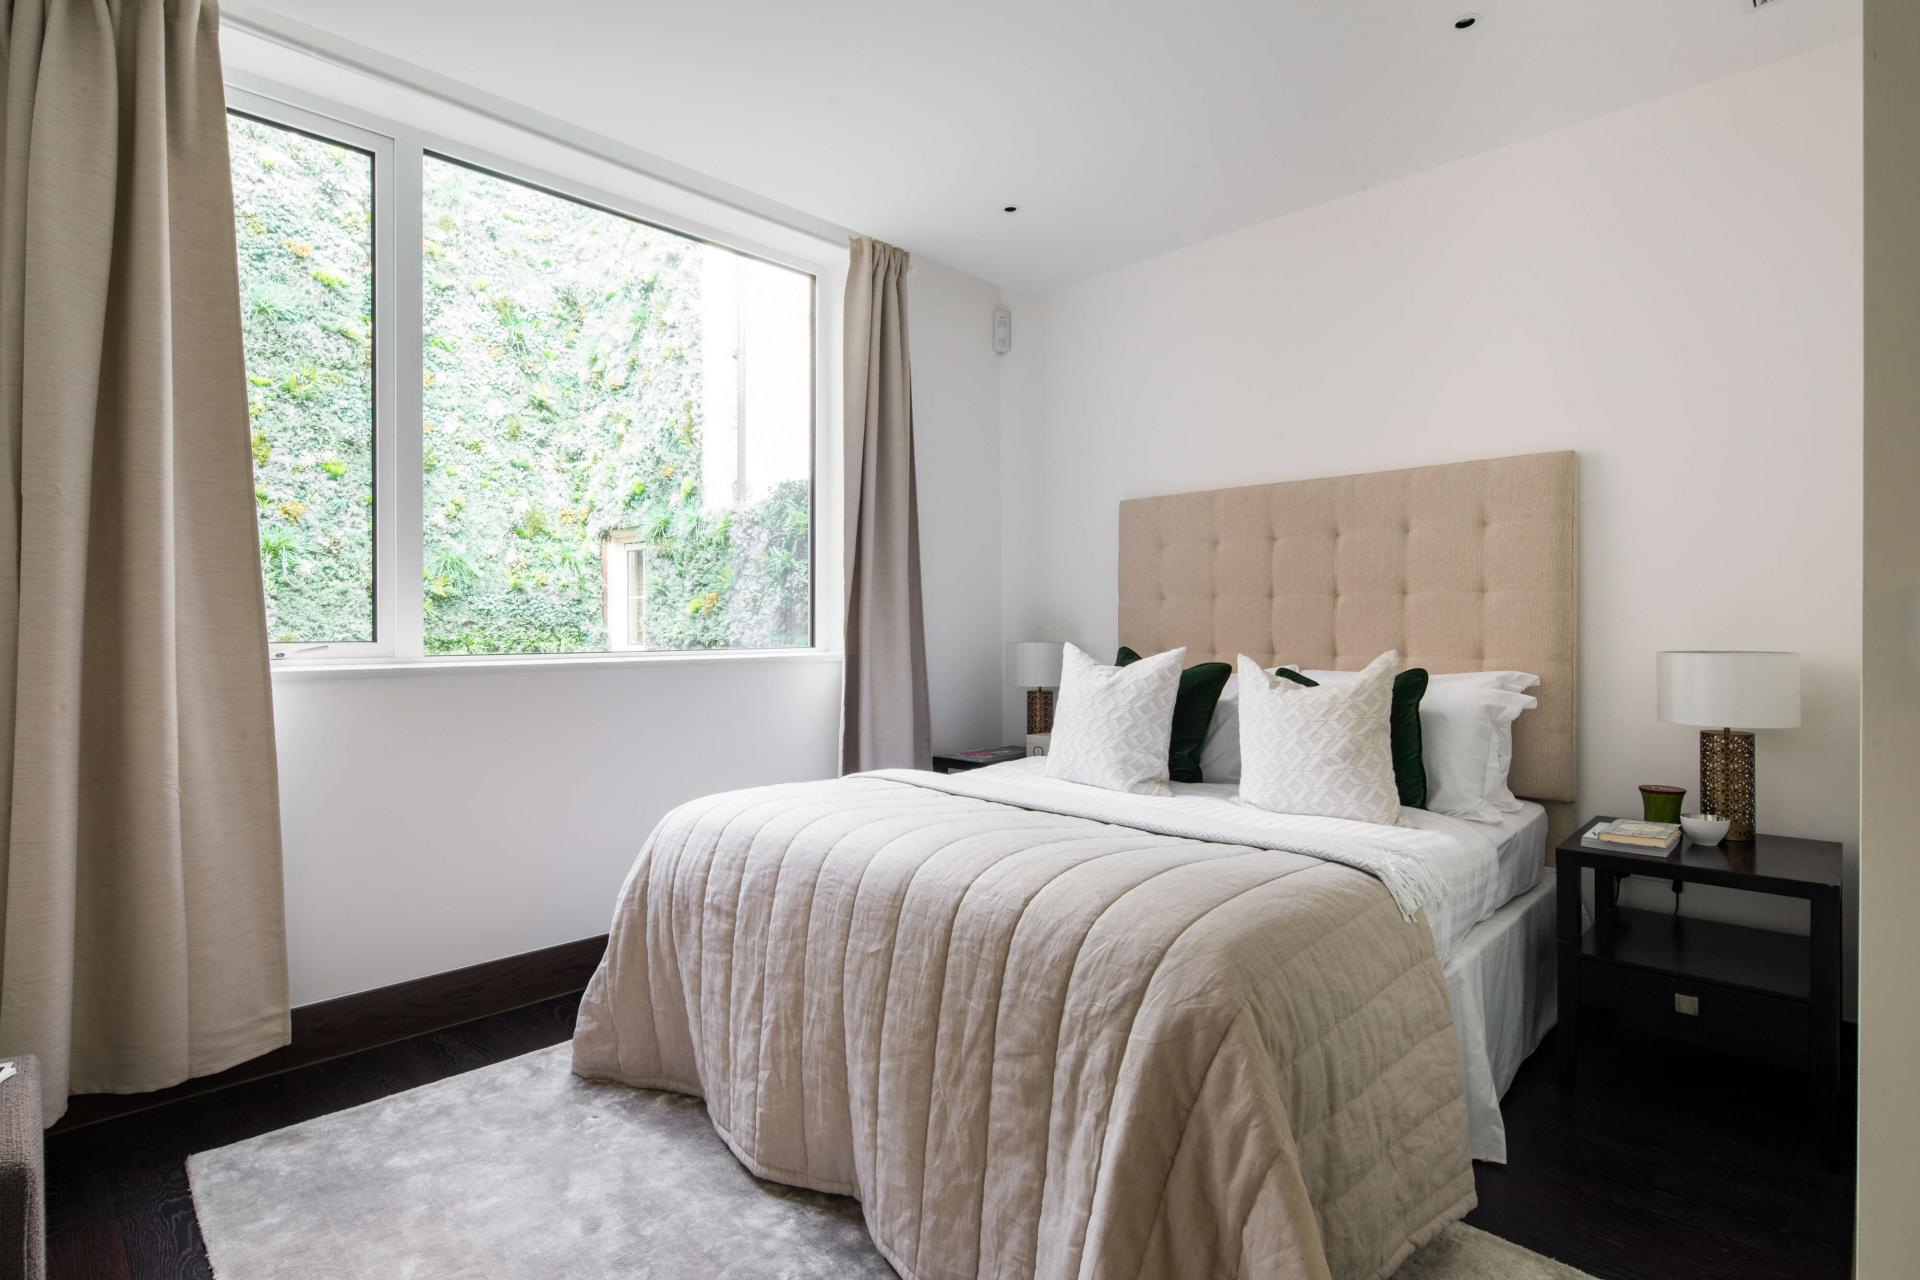 Bed at Logan Place Apartments, Kensington, London - Citybase Apartments